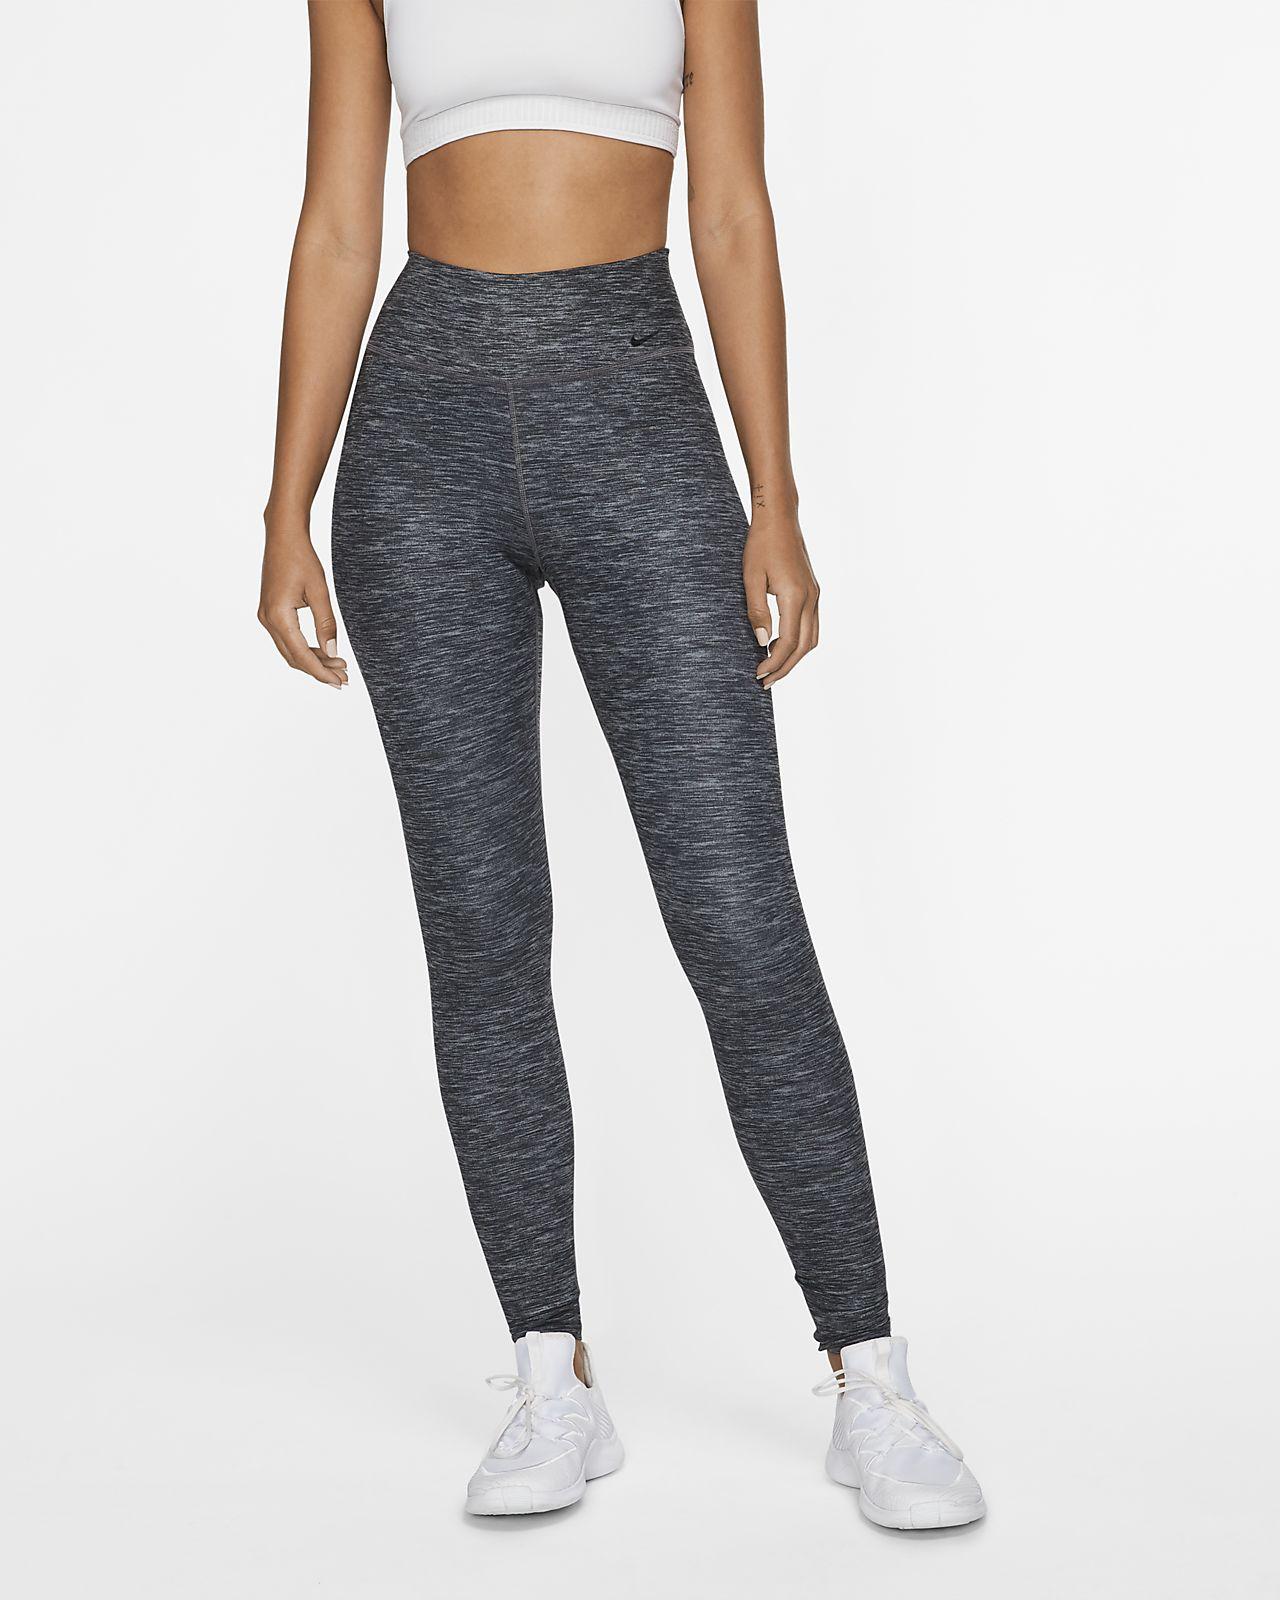 Nike One Luxe Malles jaspiades amb cintura mitjana - Dona